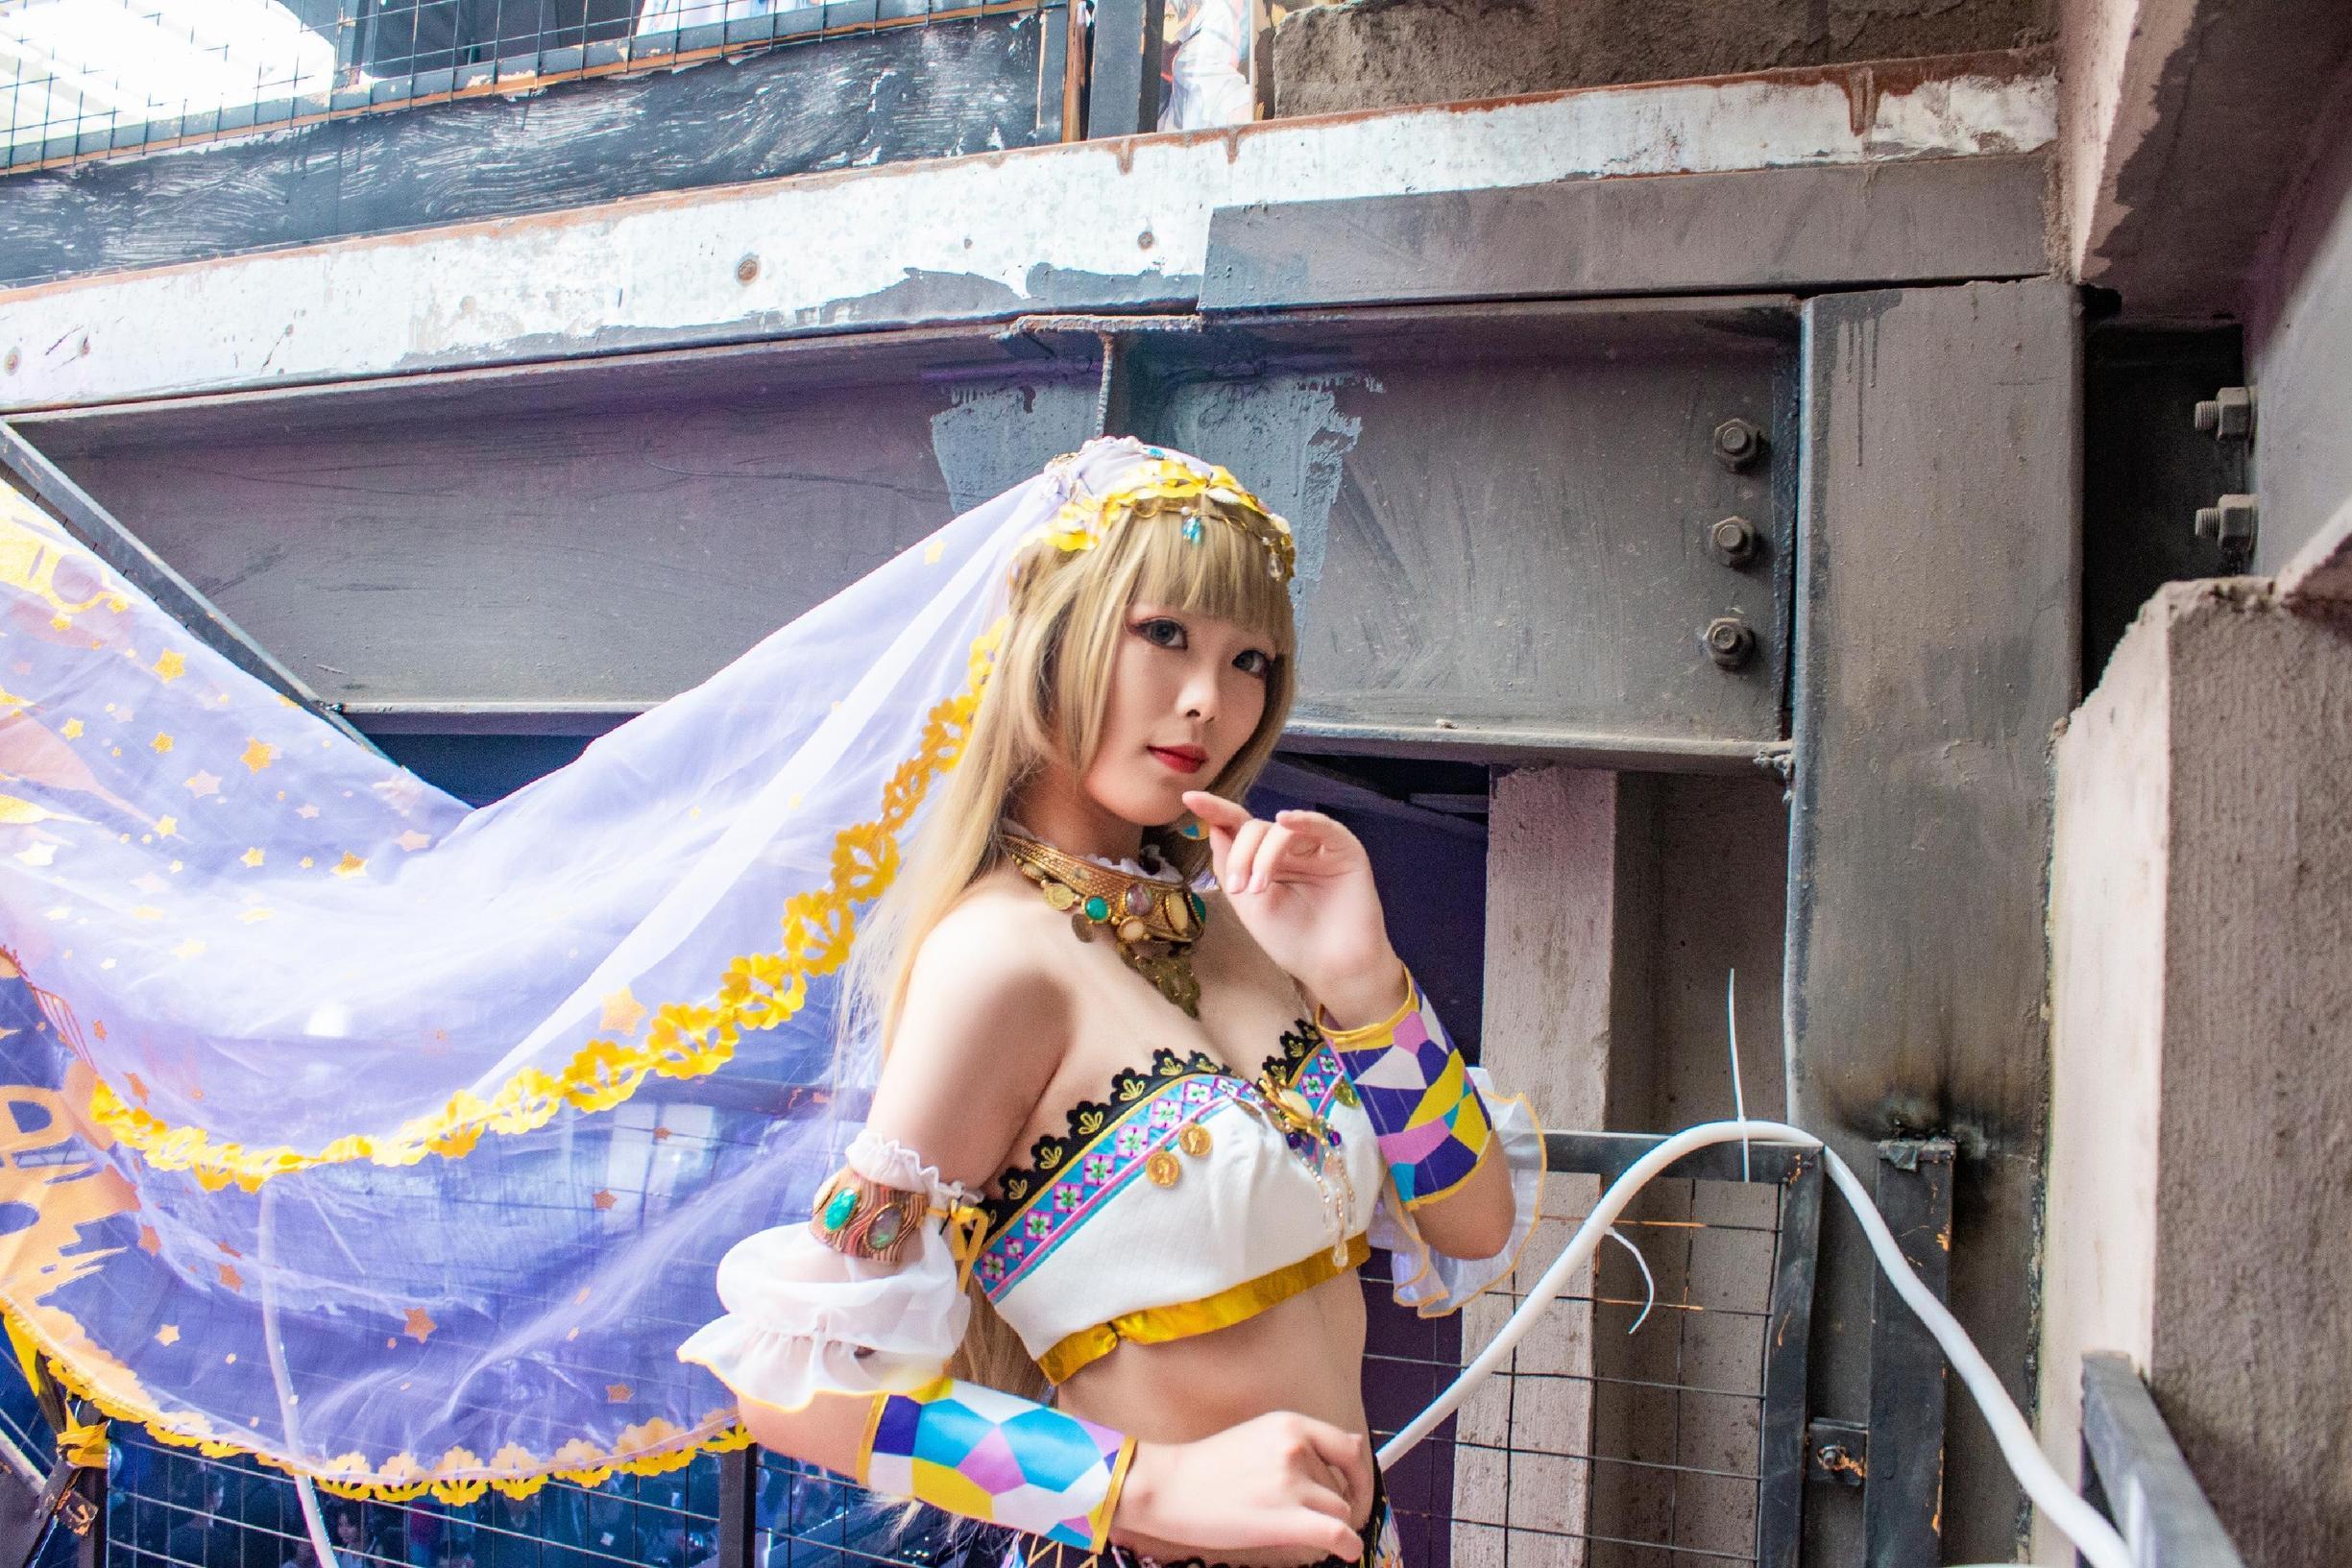 《LOVE LIVE!》漫展cosplay【CN:亦遥_林梓晕3D】-第5张